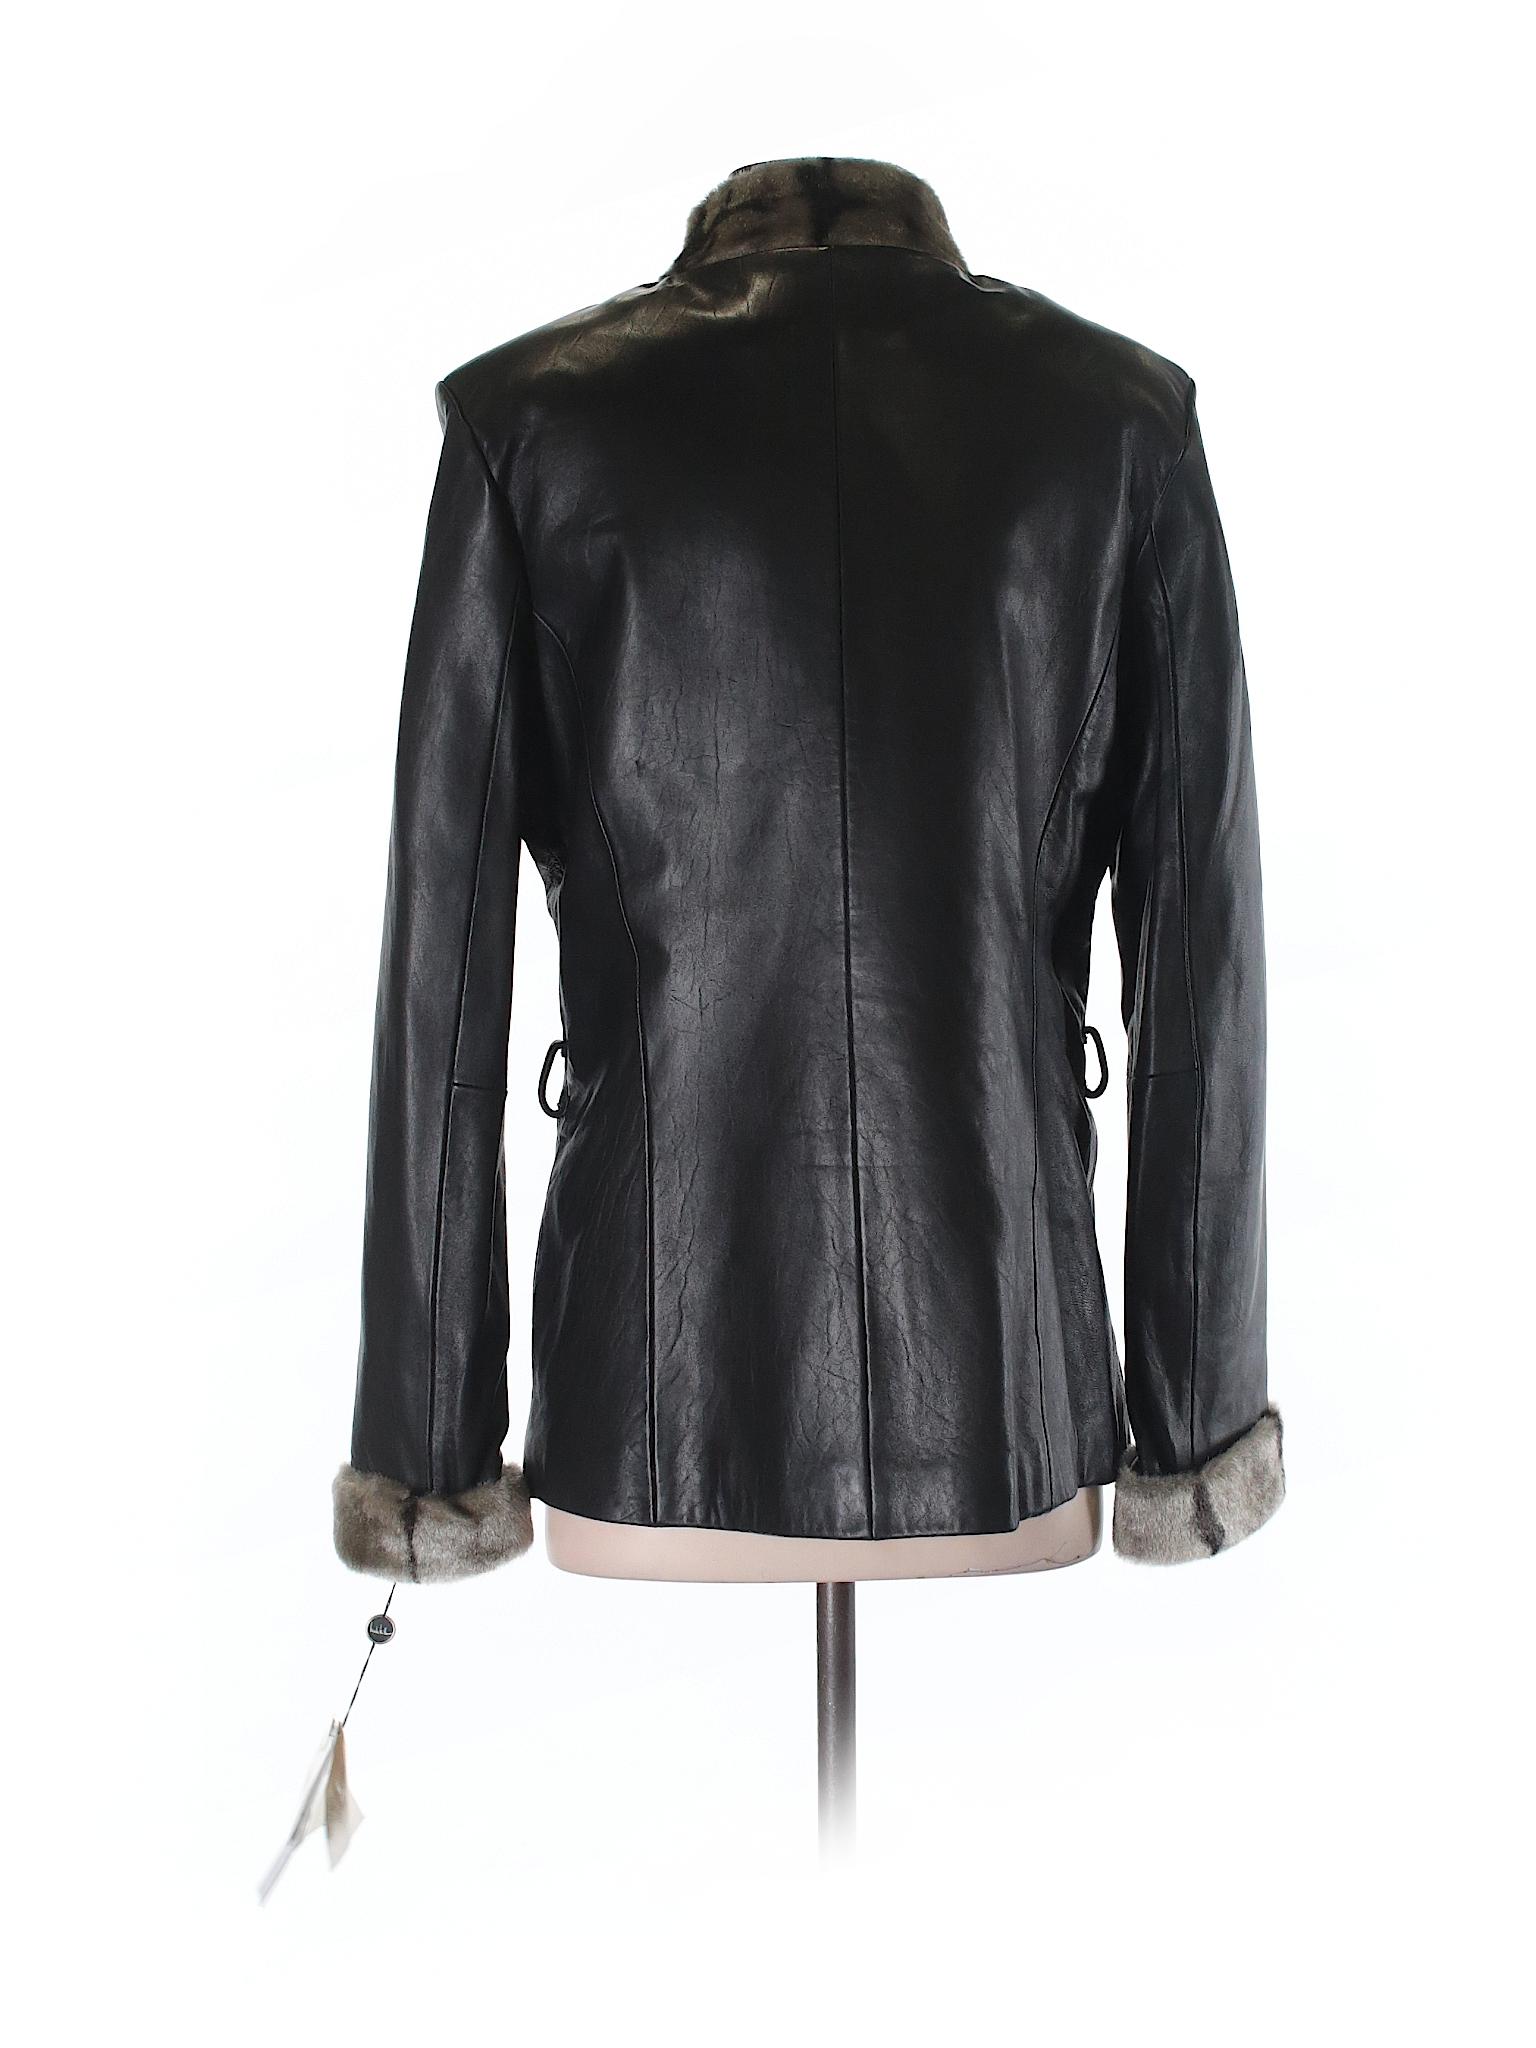 Nicole Miller Jacket Leather winter Boutique RnTP6q7w